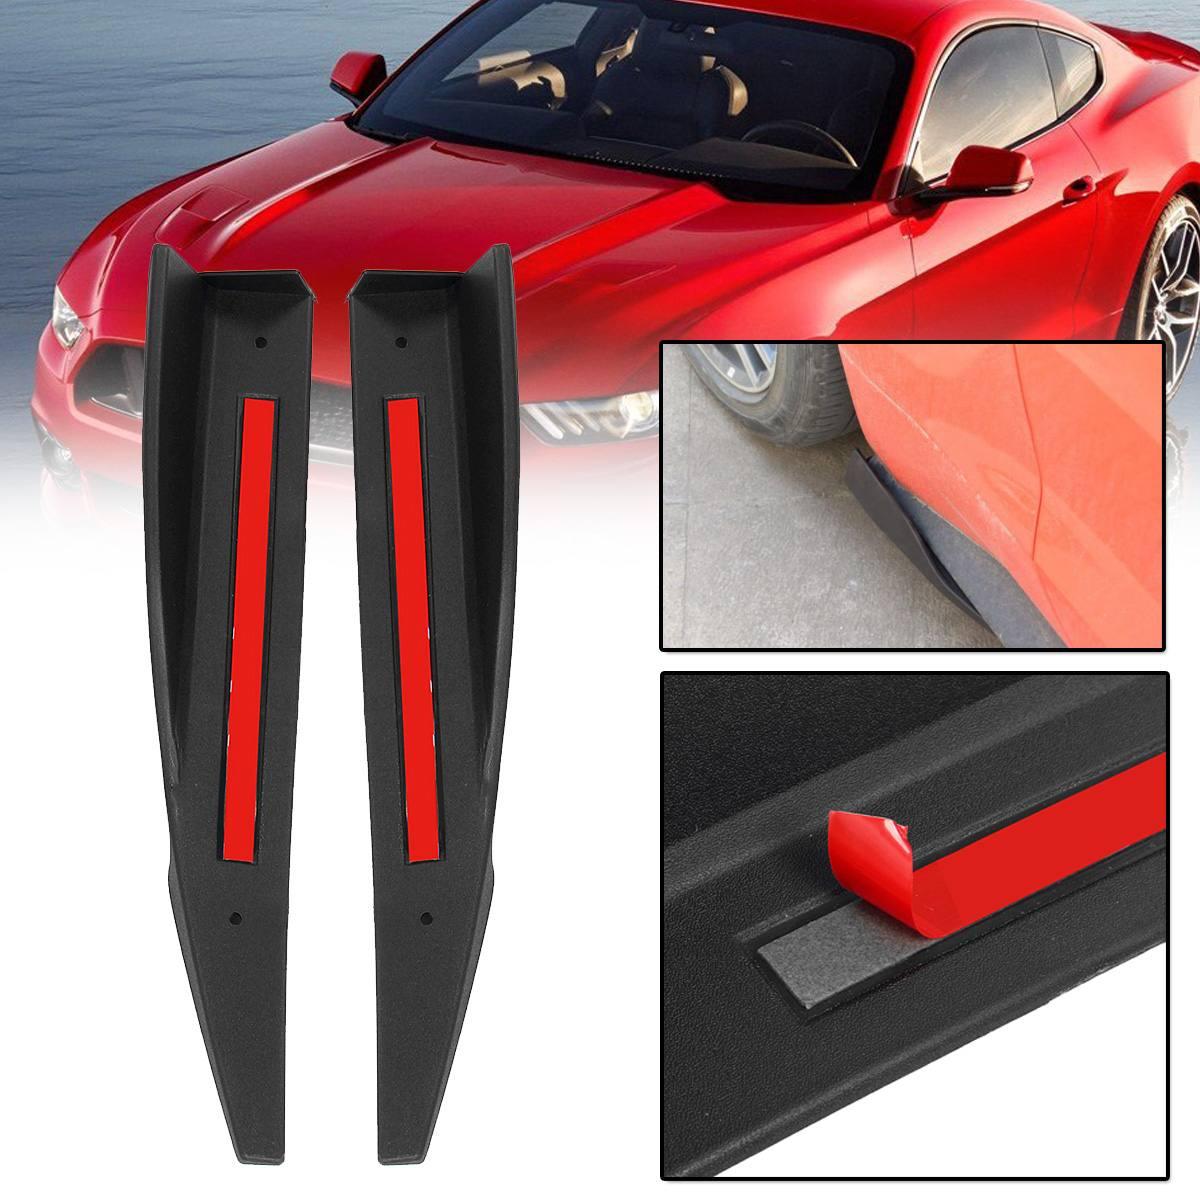 2PCS 36cm Universal Auto Körper Seite Röcke Verlängerung Rocker Splitter Diffusor Winglet Stoßstange Für Ford Für Mustang 2015 2016 2017